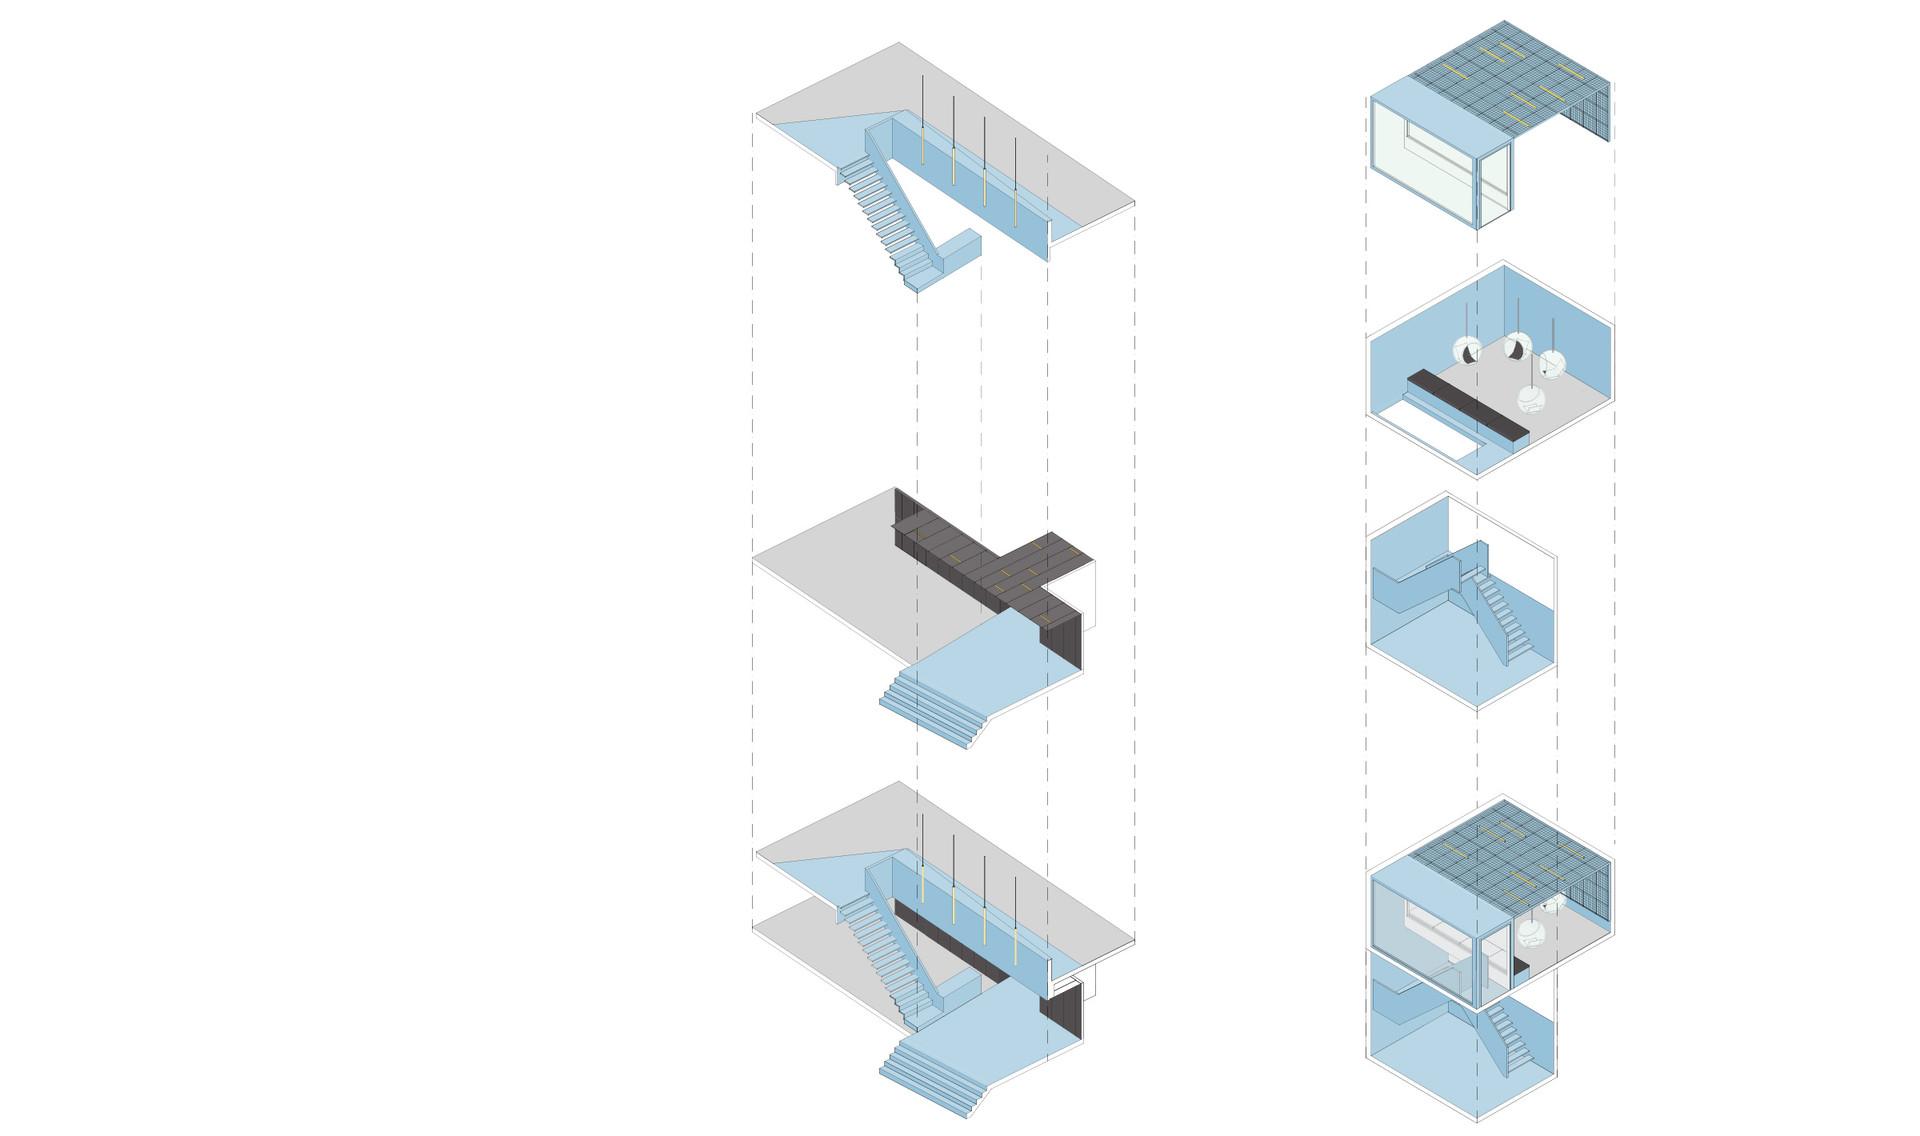 2002_DAMAST-architects_Intersell_16.jpg